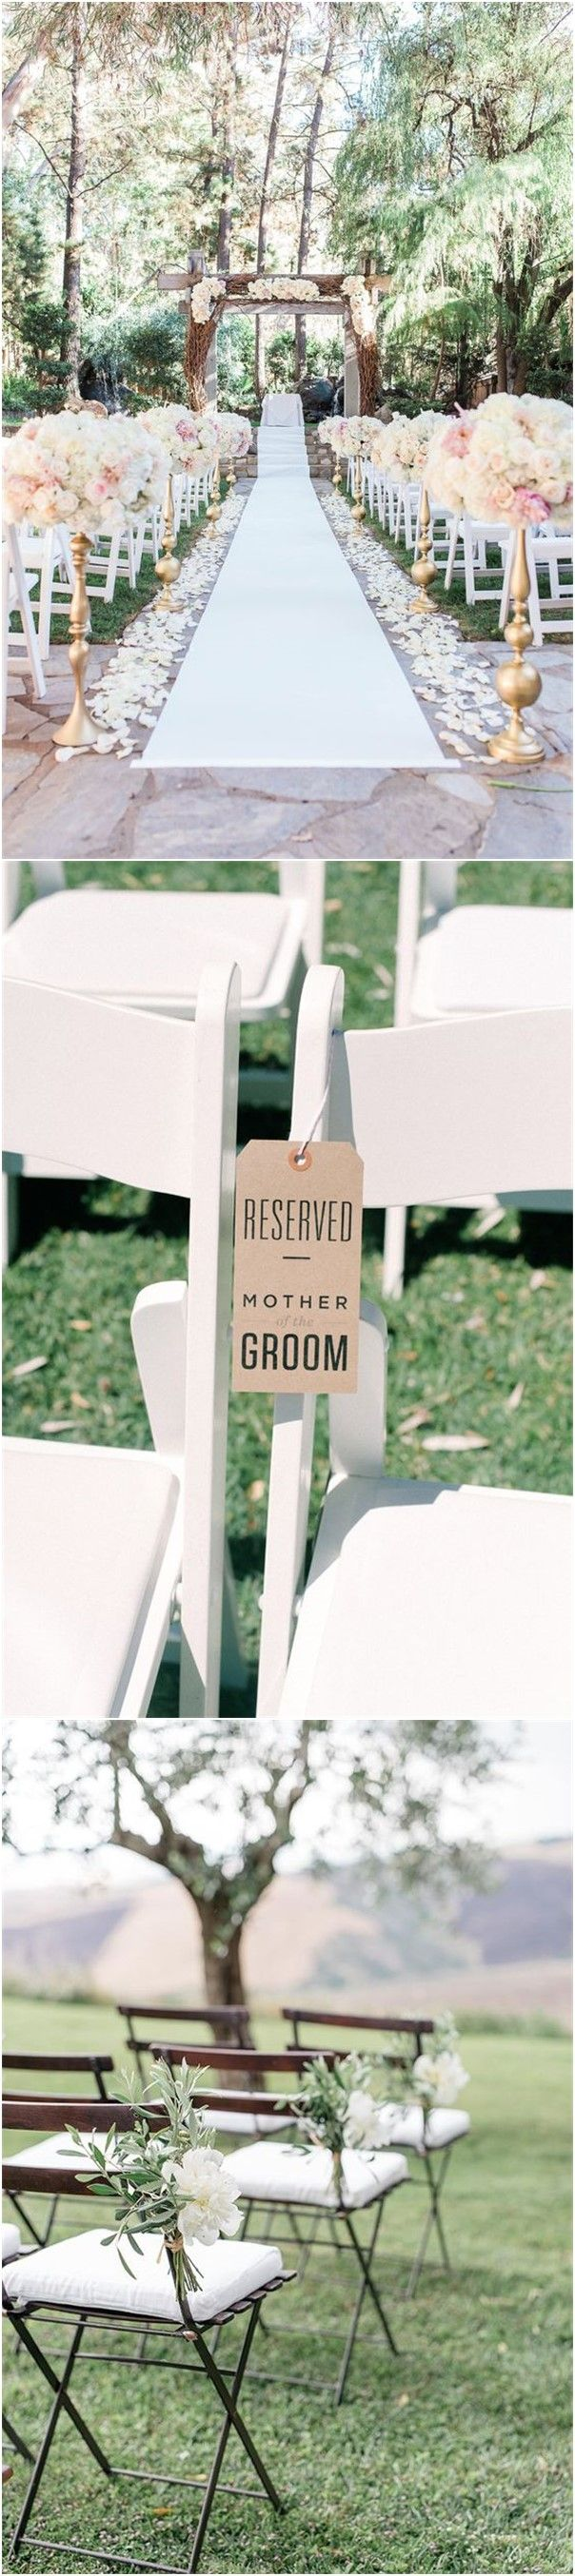 25 Rustic Outdoor Wedding Ceremony Decorations Ideas | Pinterest ...